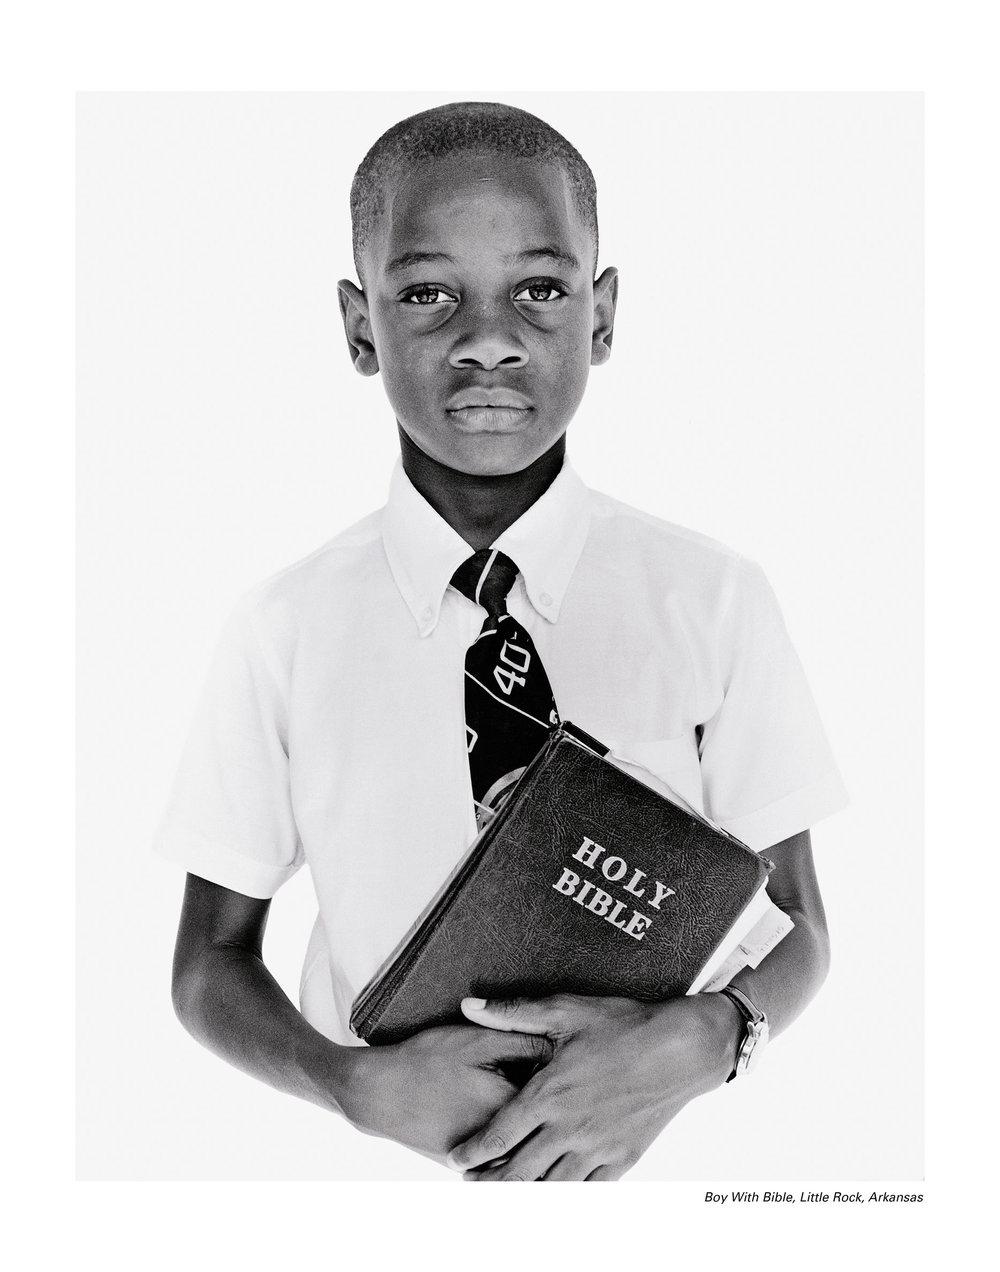 Boy_With_Bible_Arkansas.jpg